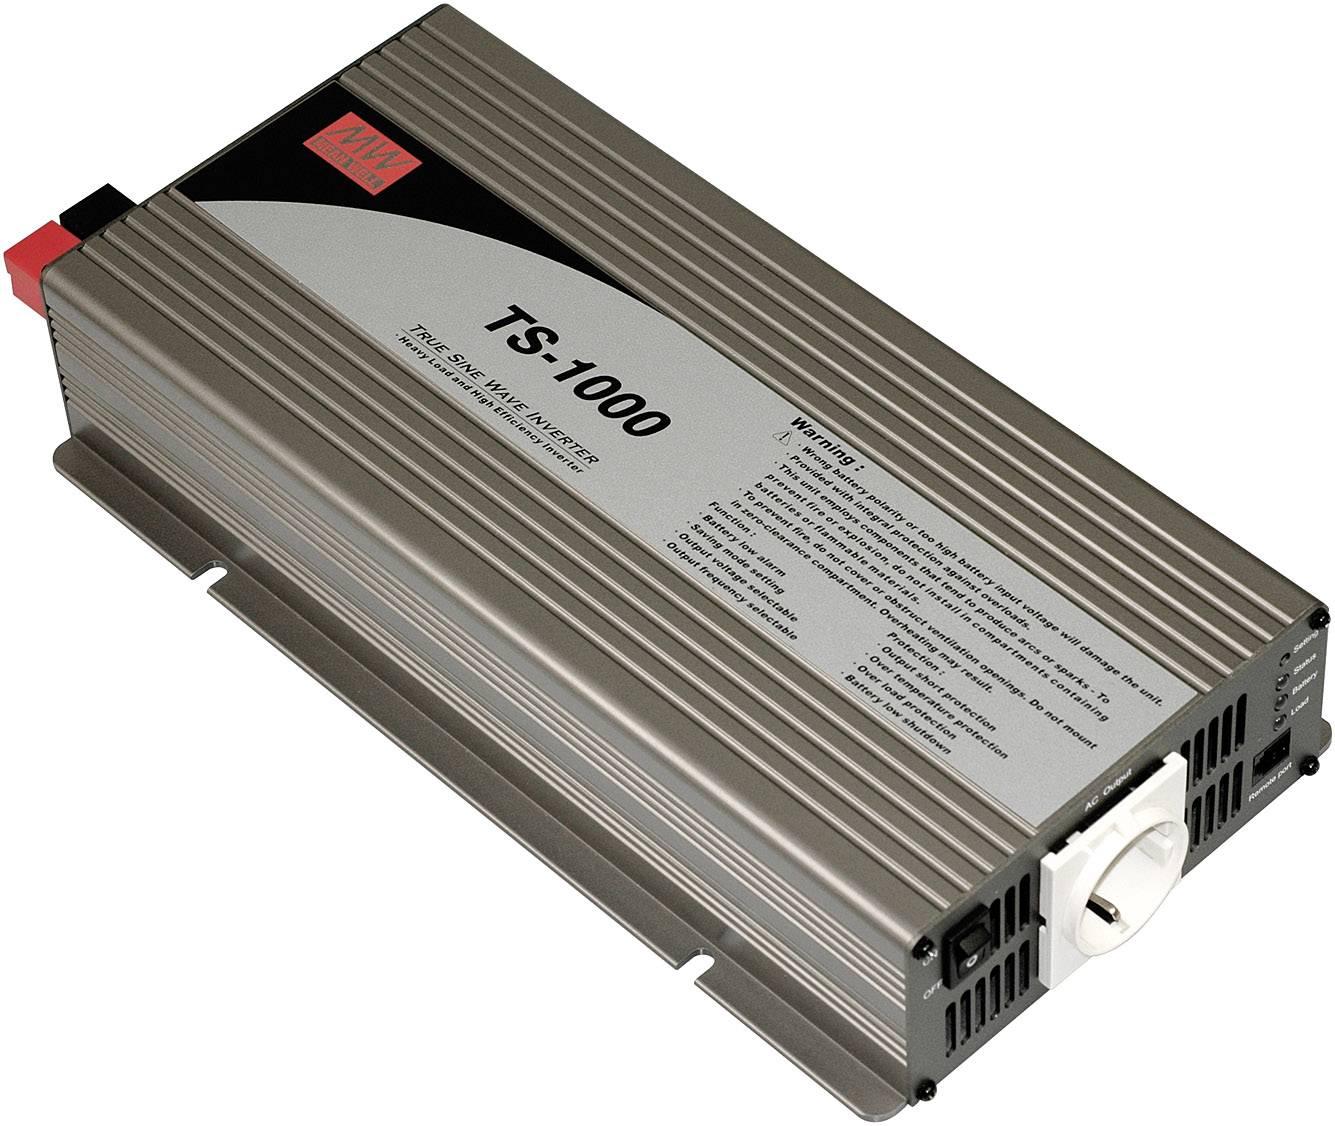 Měnič napětí Mean Well TS-1000-212B, 1000 W, 12 V/DC/1000 W